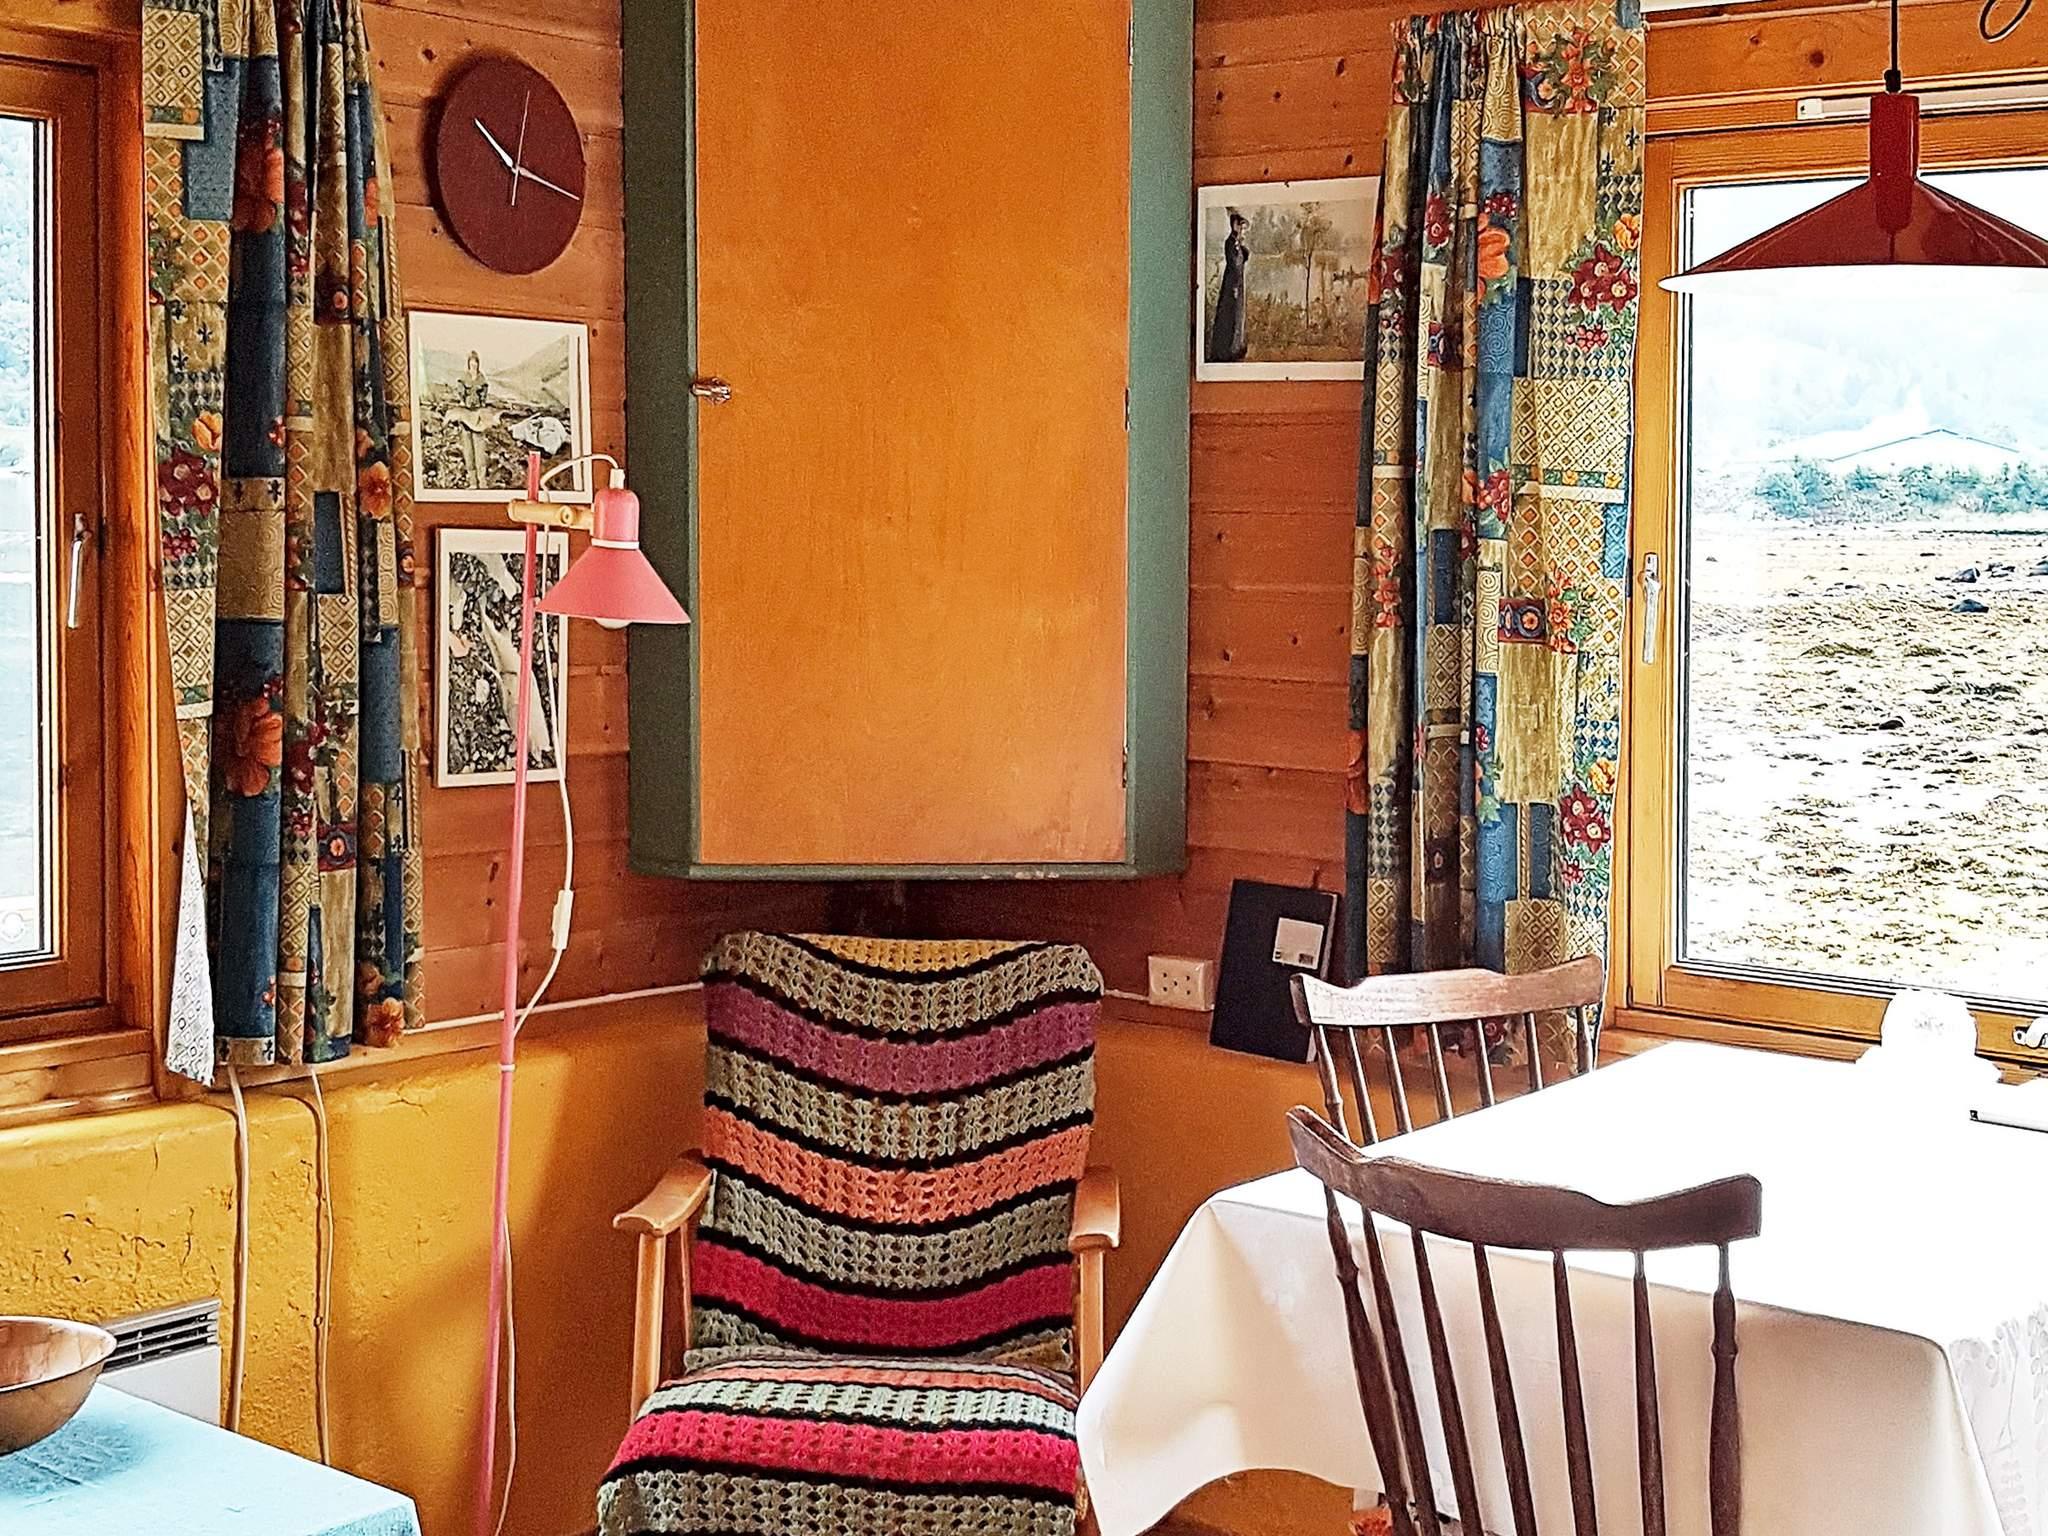 Ferienhaus Vistdal (85941), Vistdal, More - Romsdal, Westnorwegen, Norwegen, Bild 3